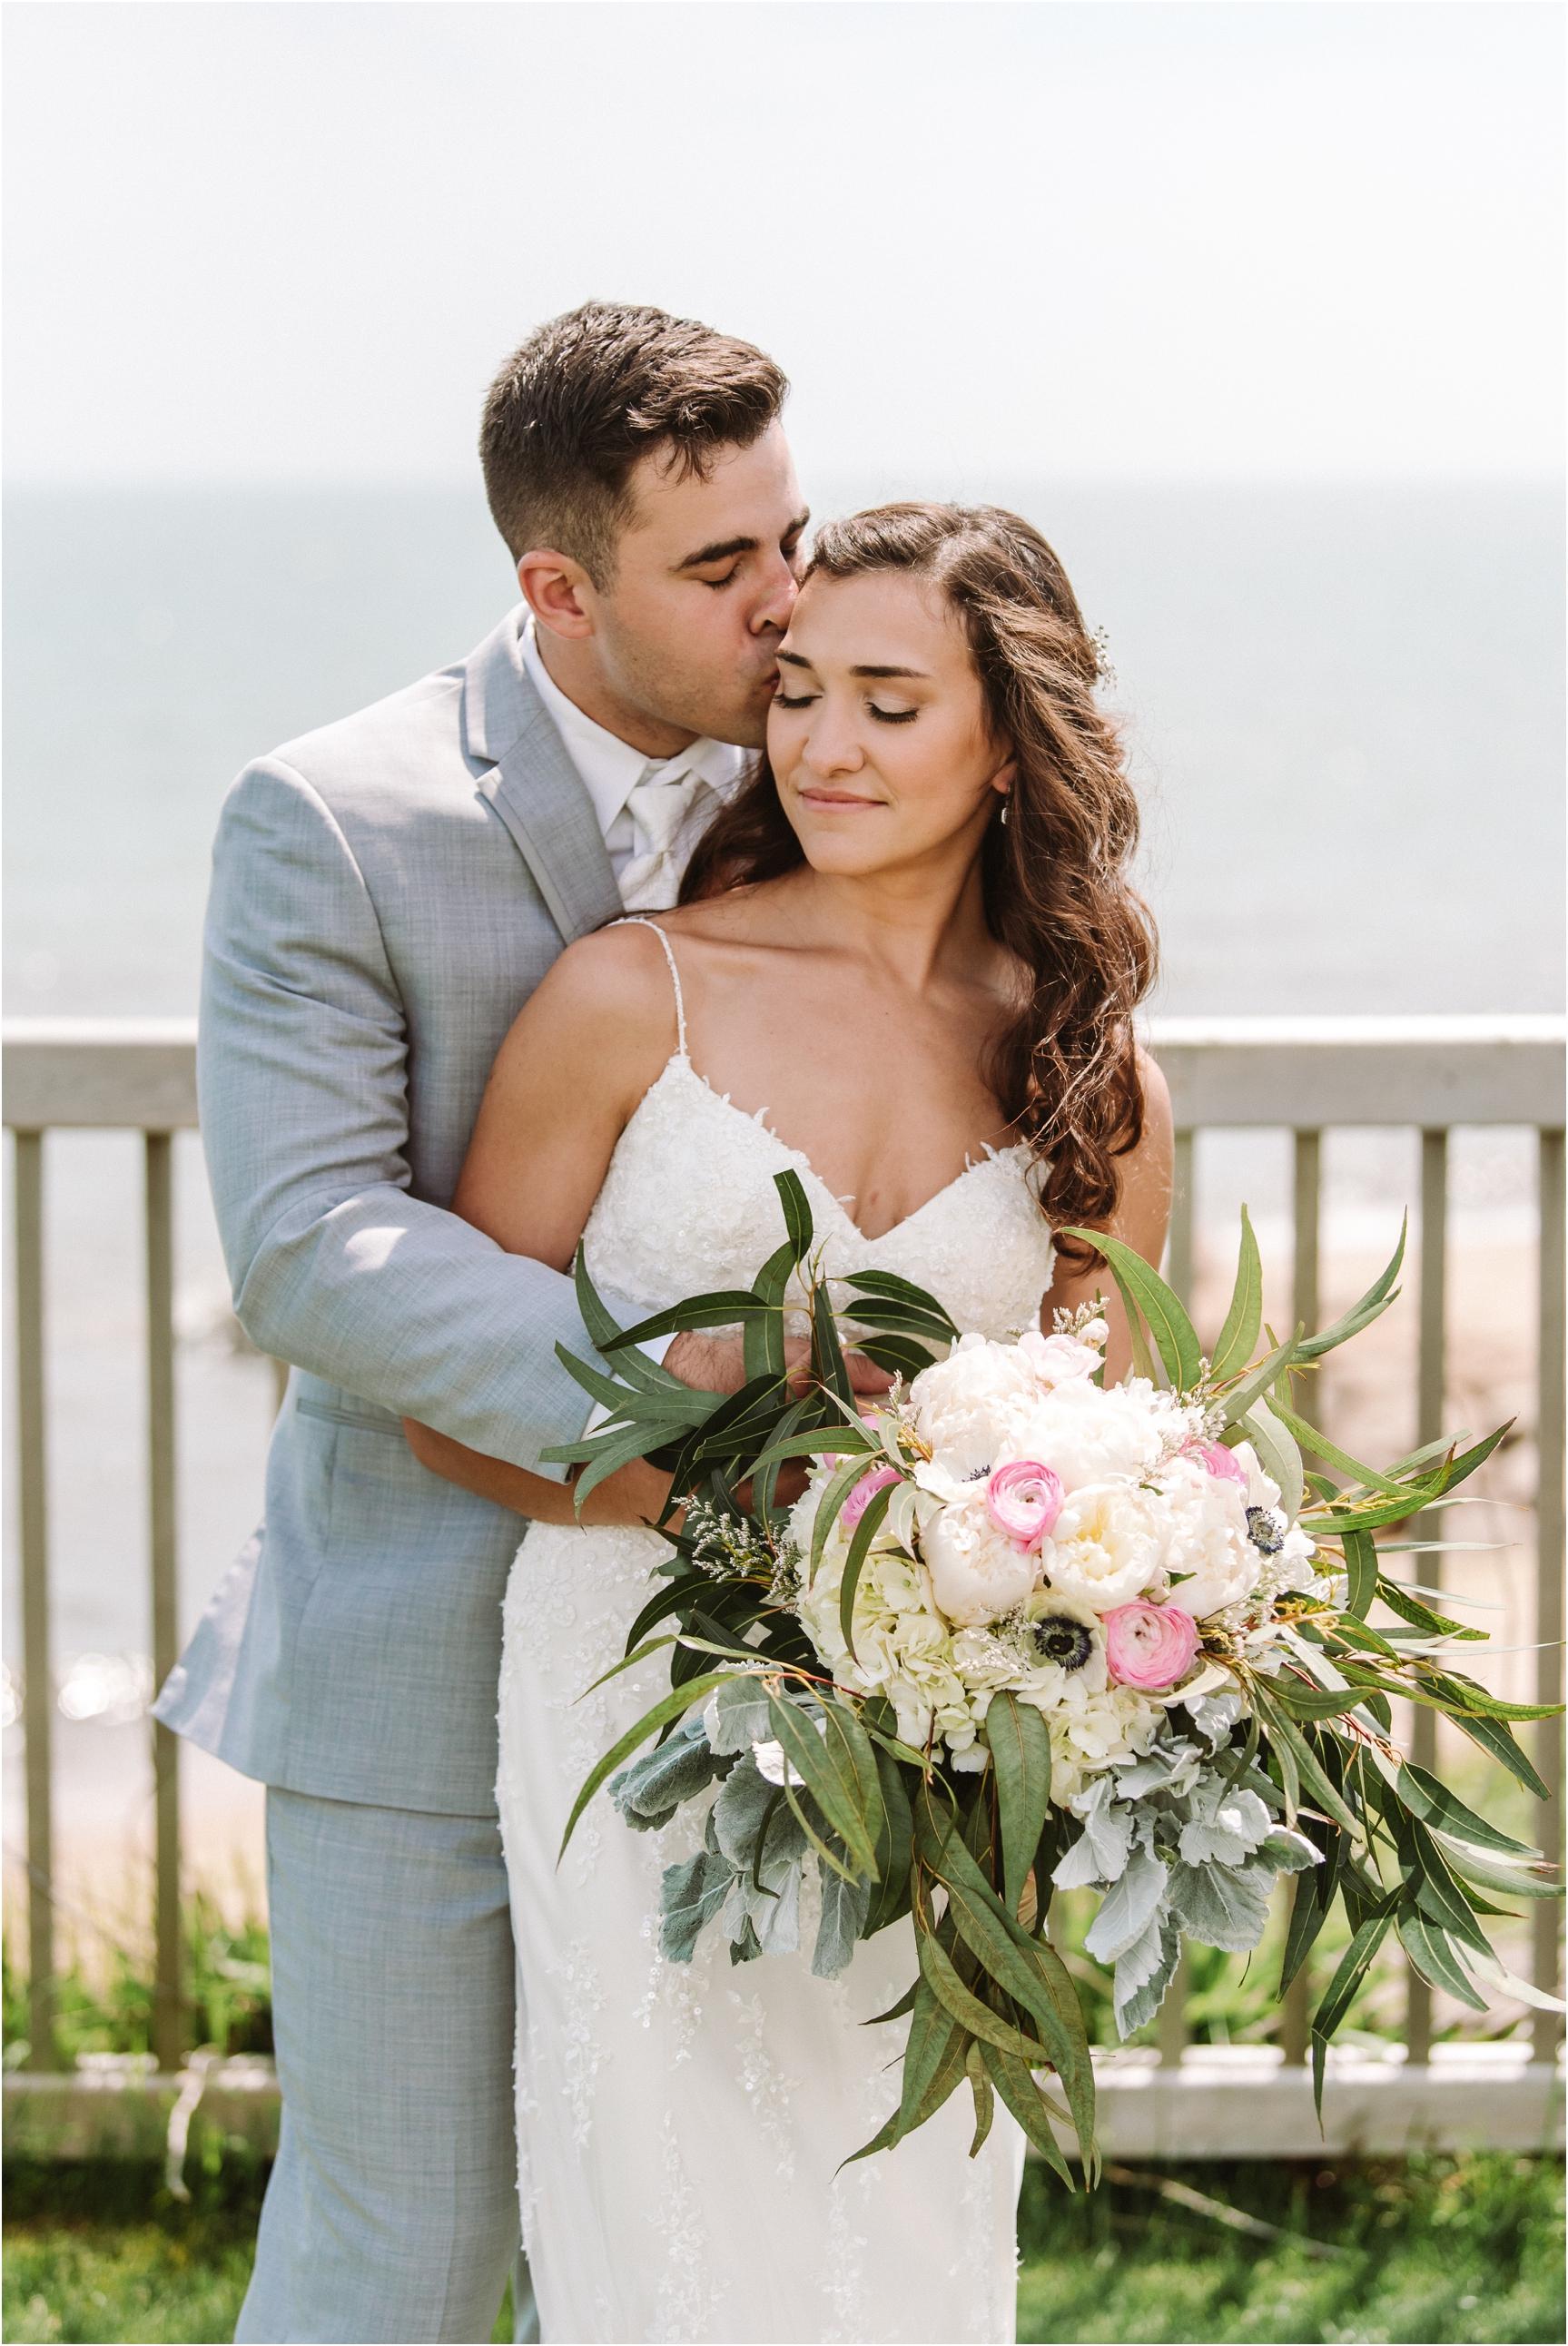 Sarah & Sam Pelham House Cape Cod Wedding Photographer-55.jpg